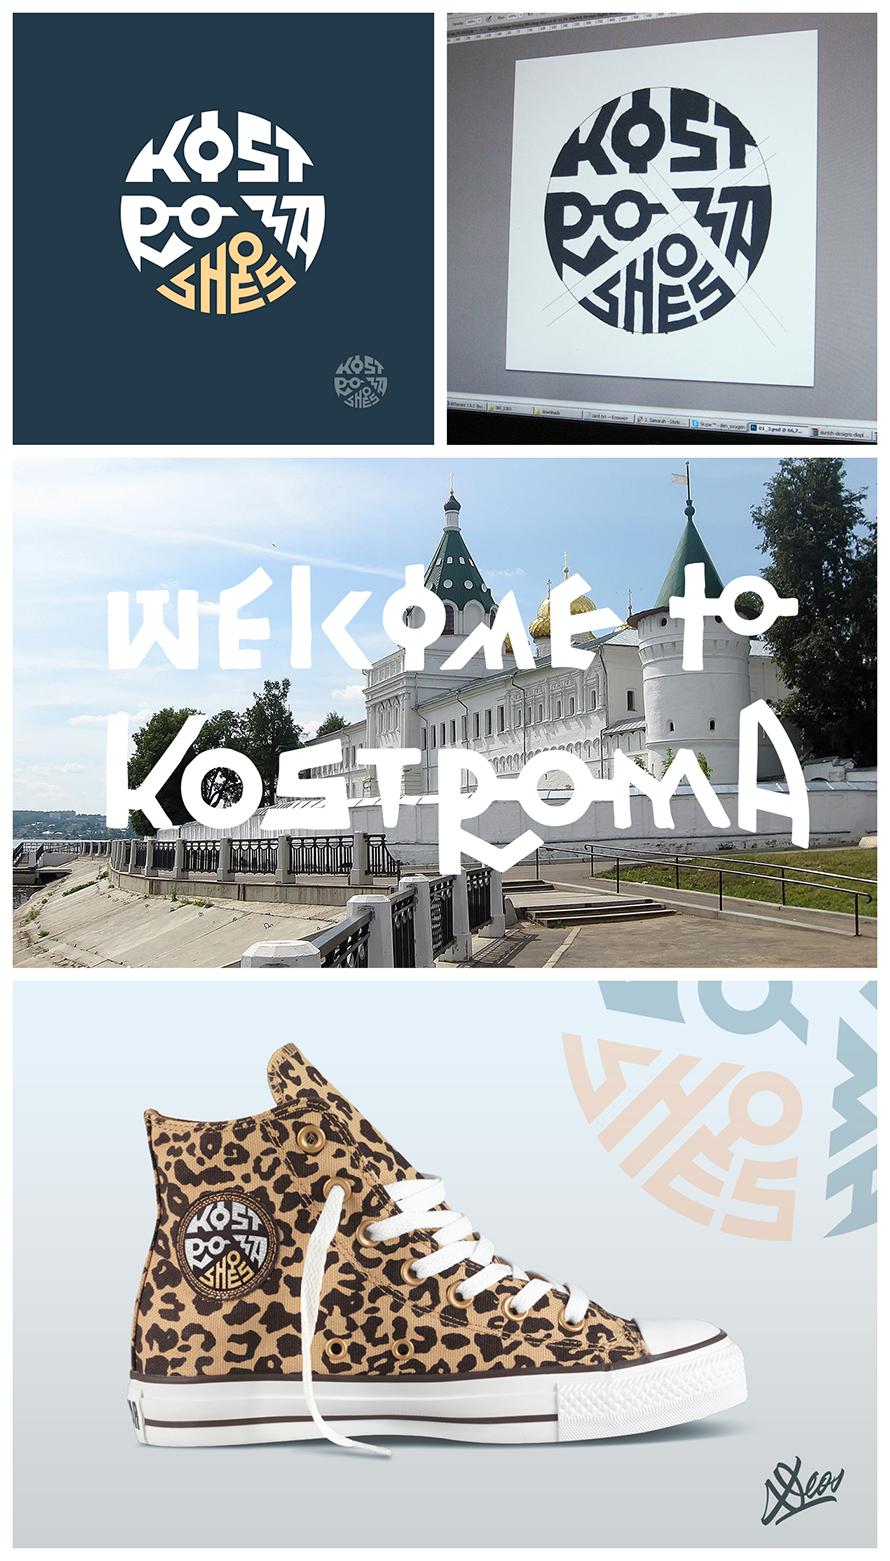 Kostroma shoes